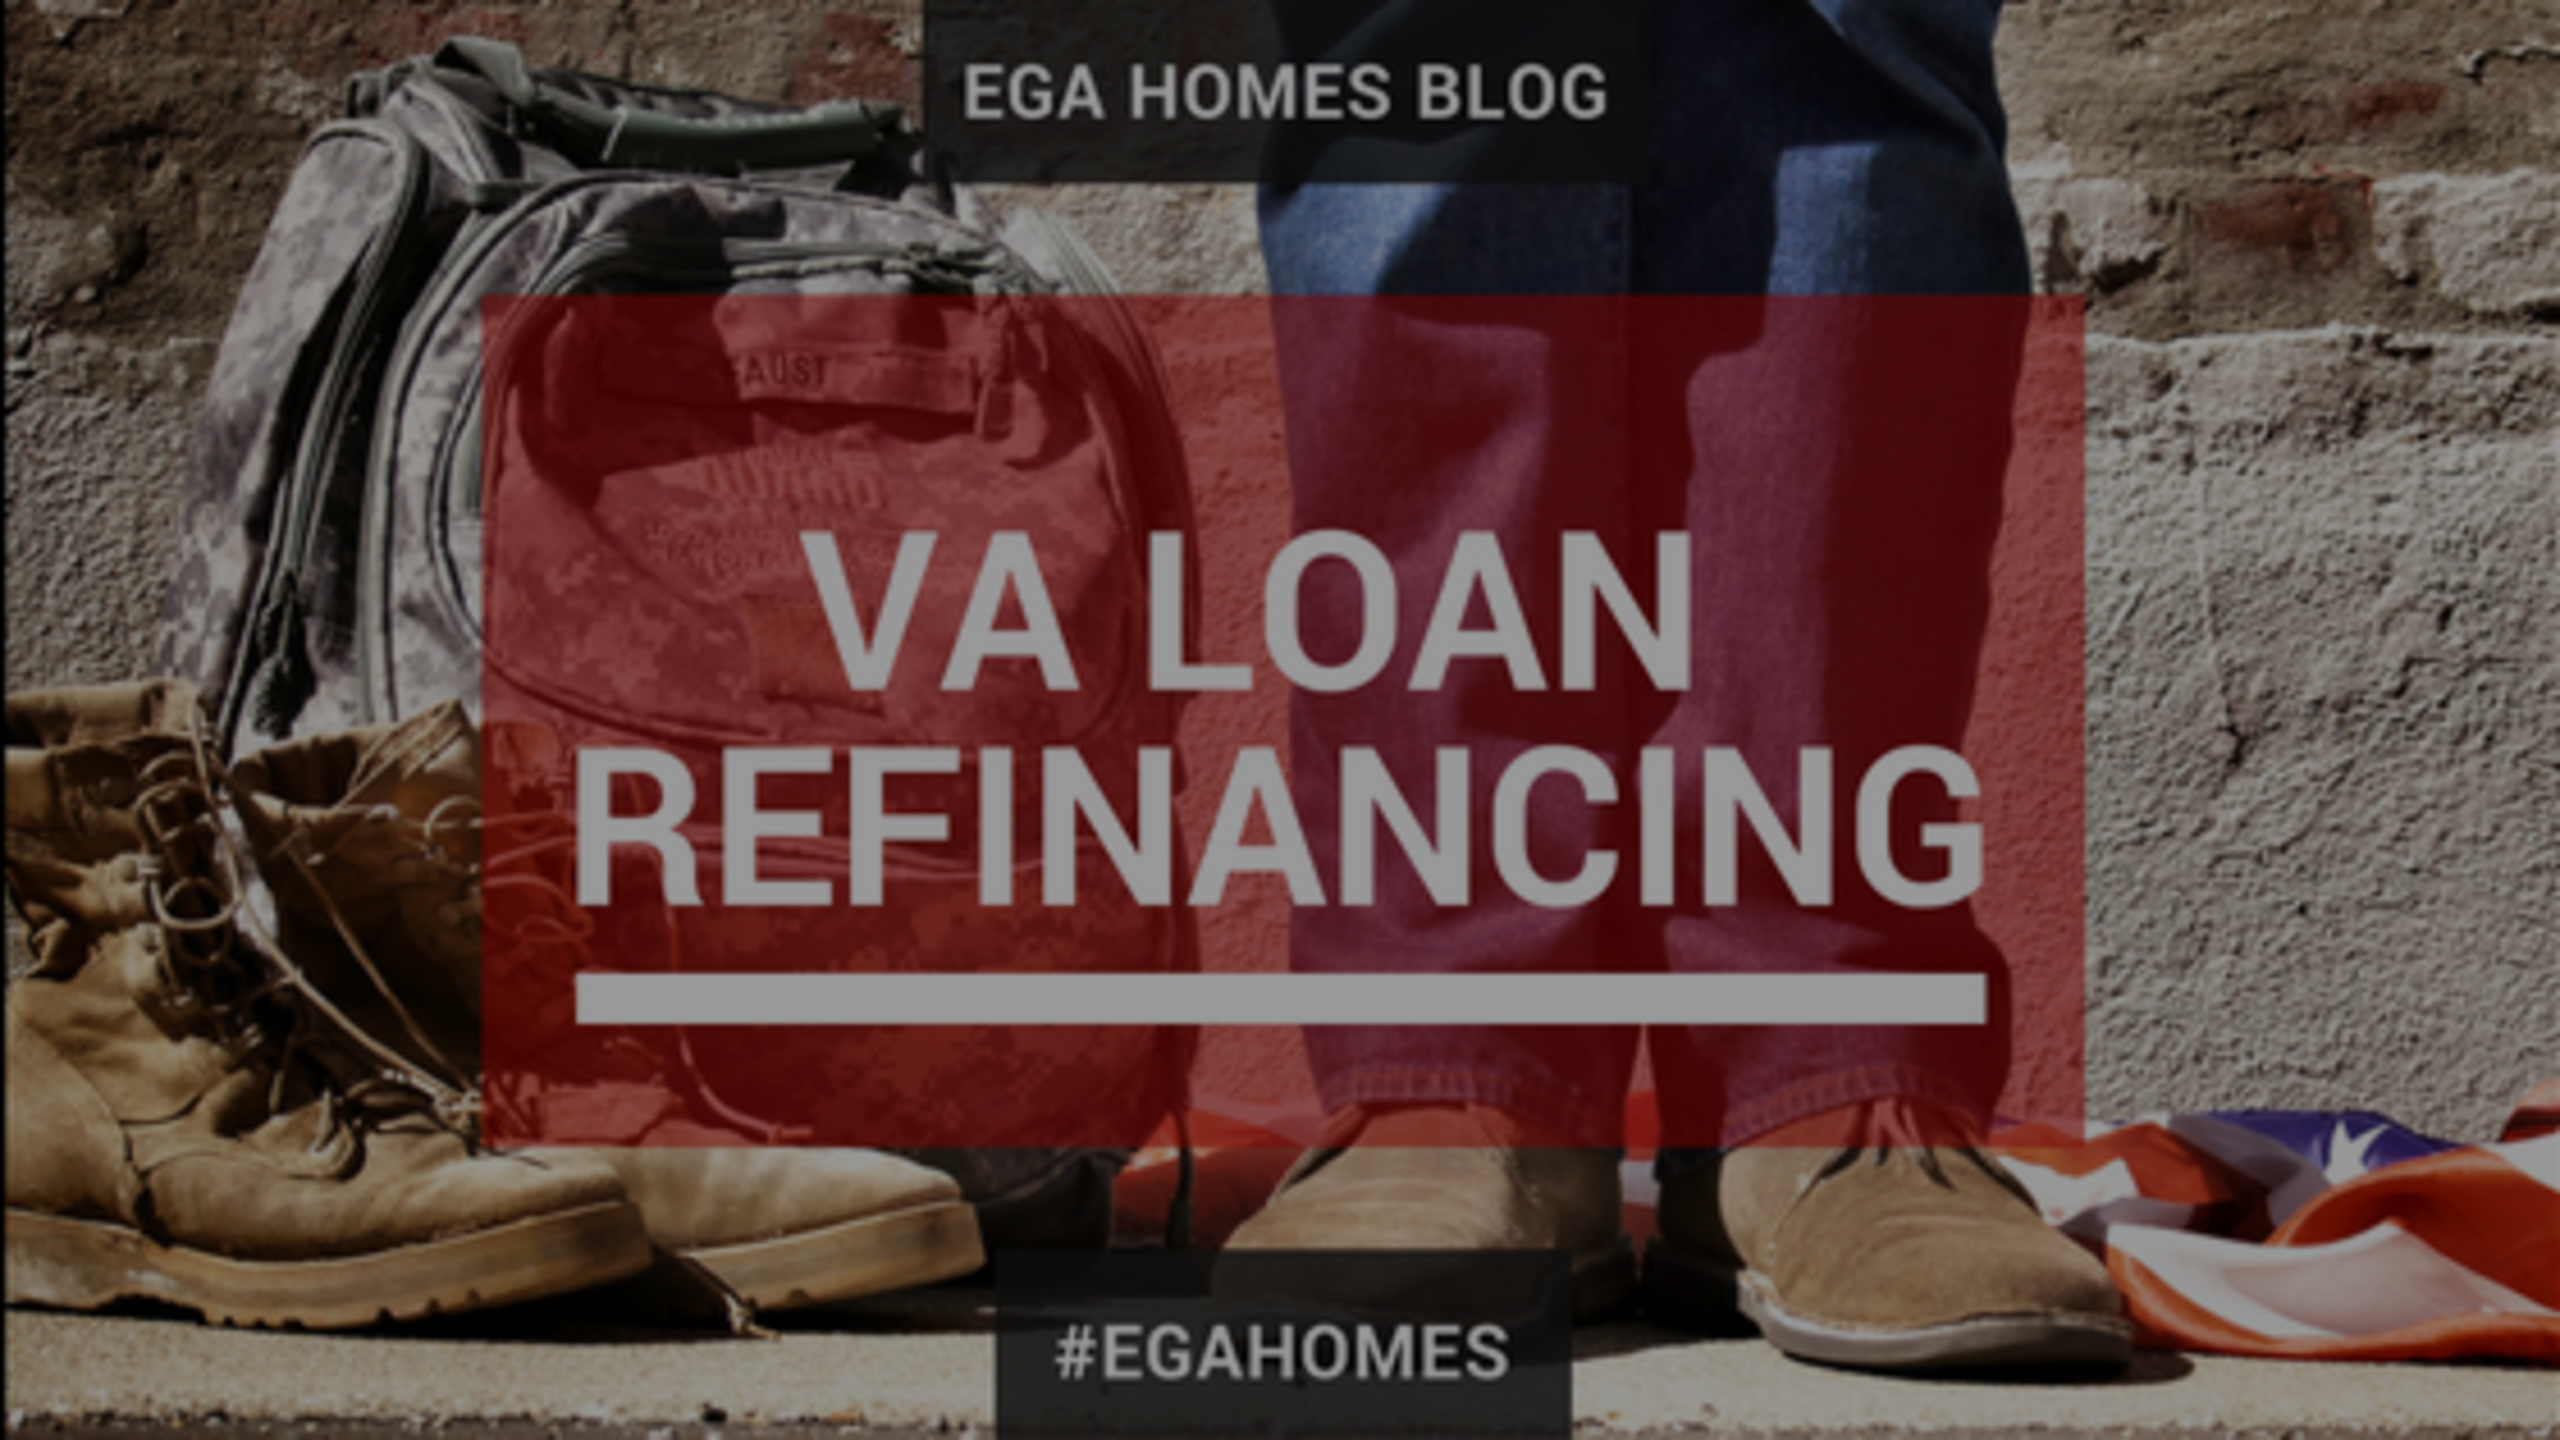 Refinance with a VA Loan